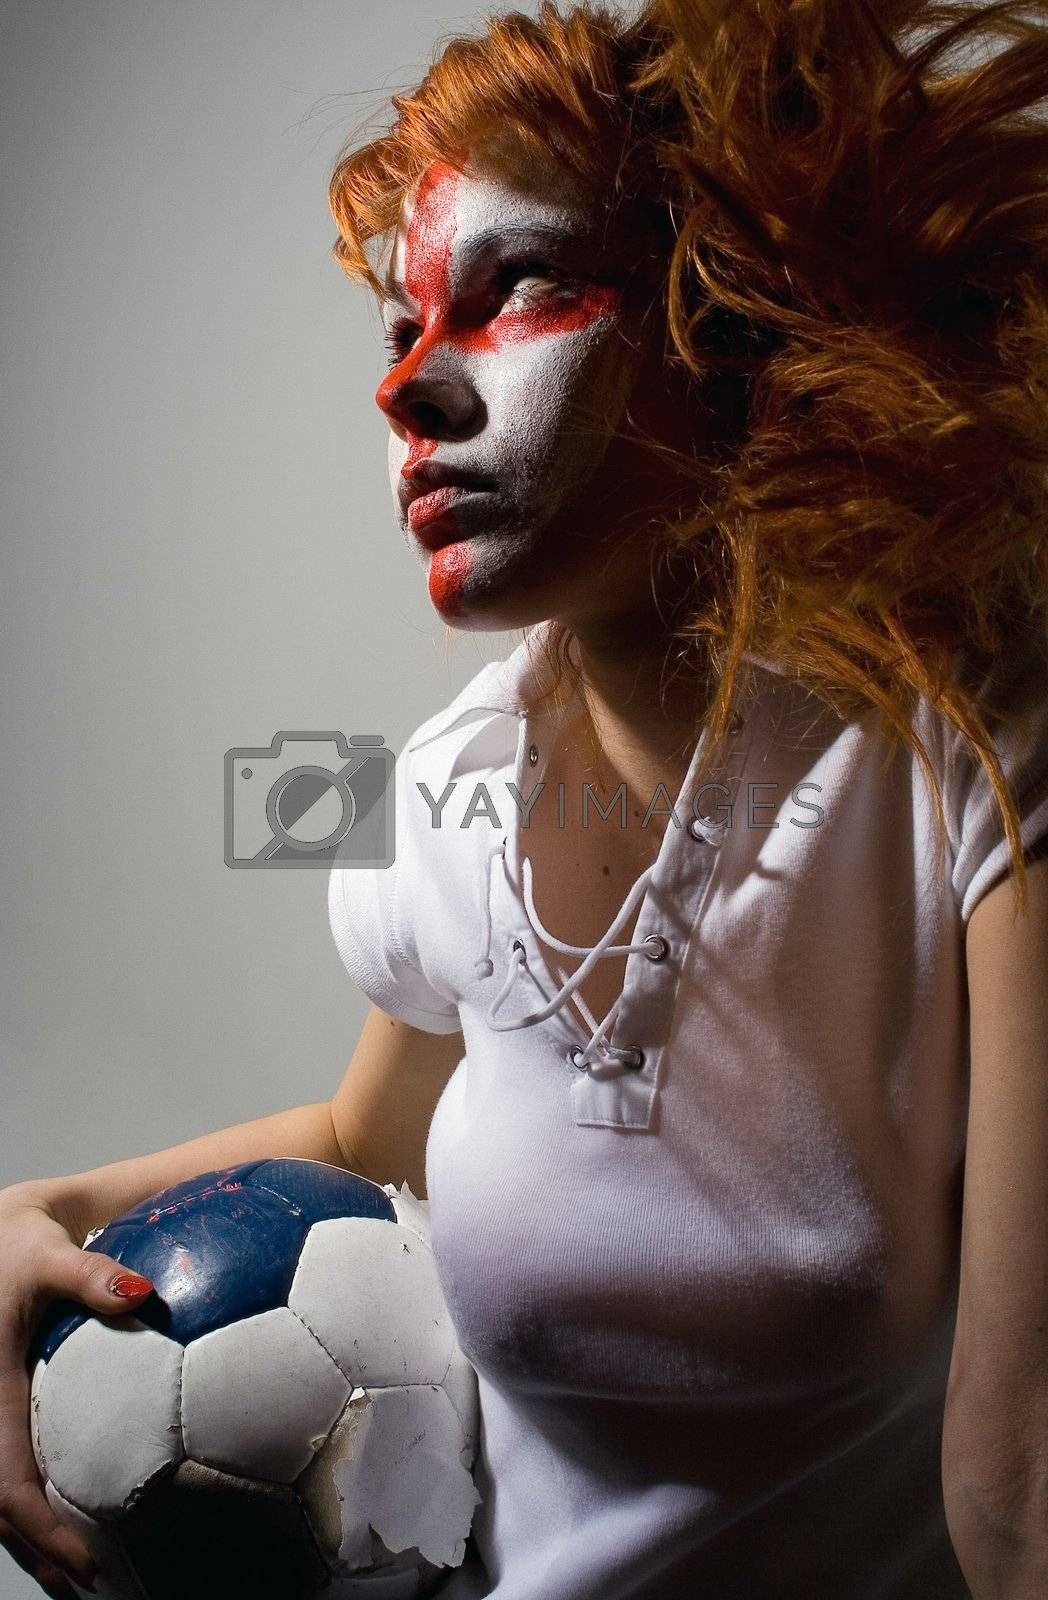 english football makeup girl holding worn soccer ball, looking forward